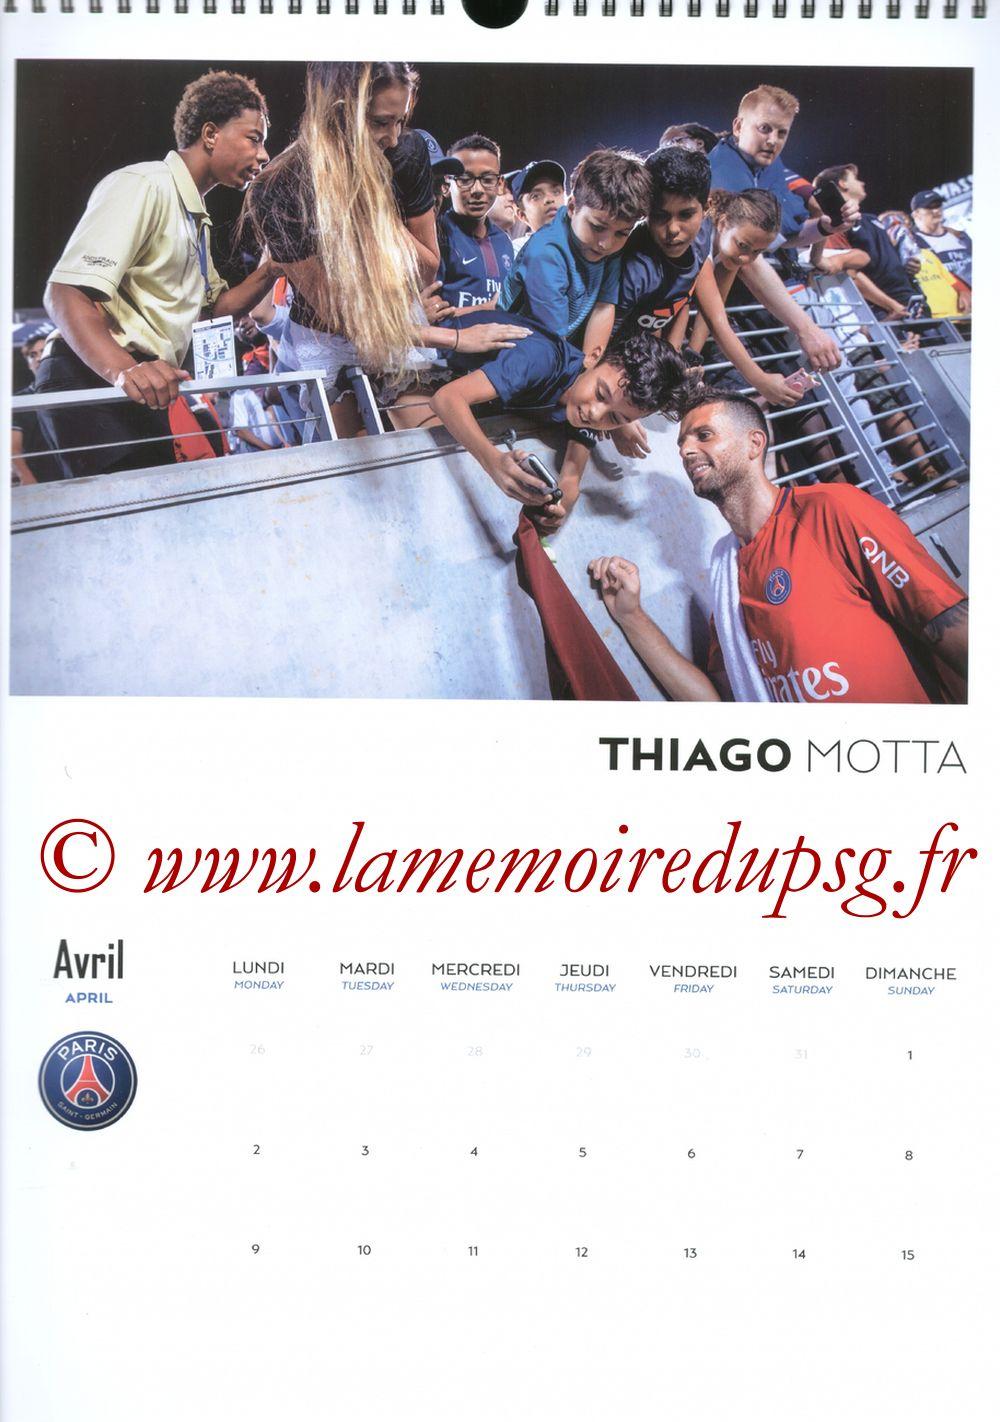 Calendrier PSG 2018 - Page 07 - Thiago MOTTA